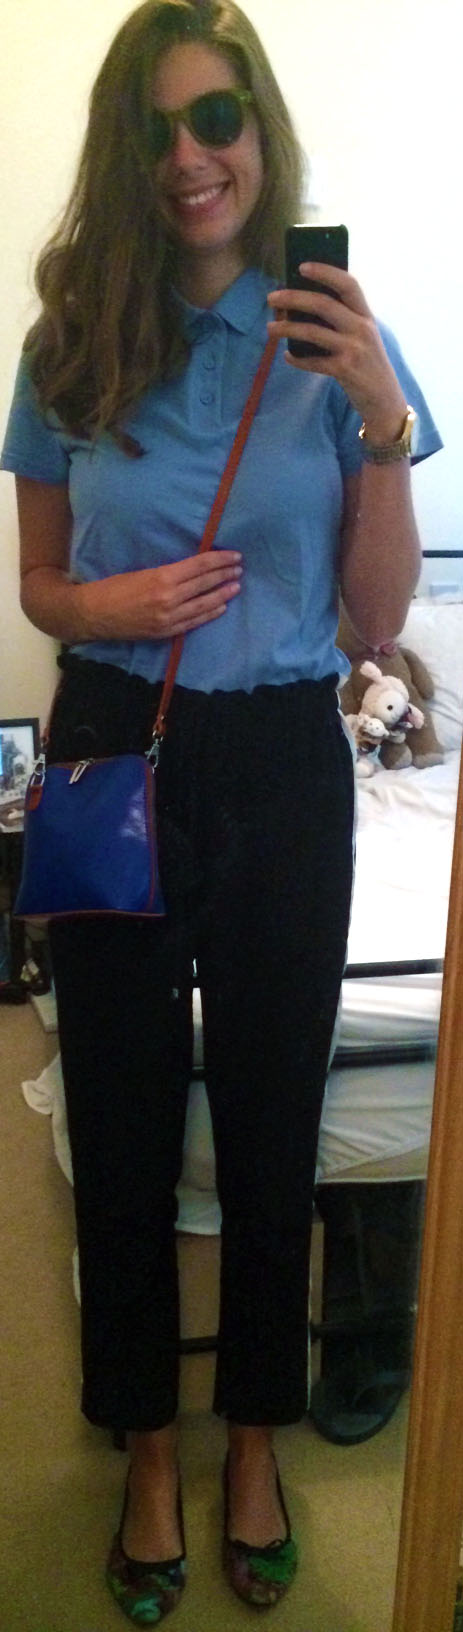 Kids Polo Shirt, River Island Cropped Trousers, Floral Flats,  Cobalt Blue Crossbody Bag